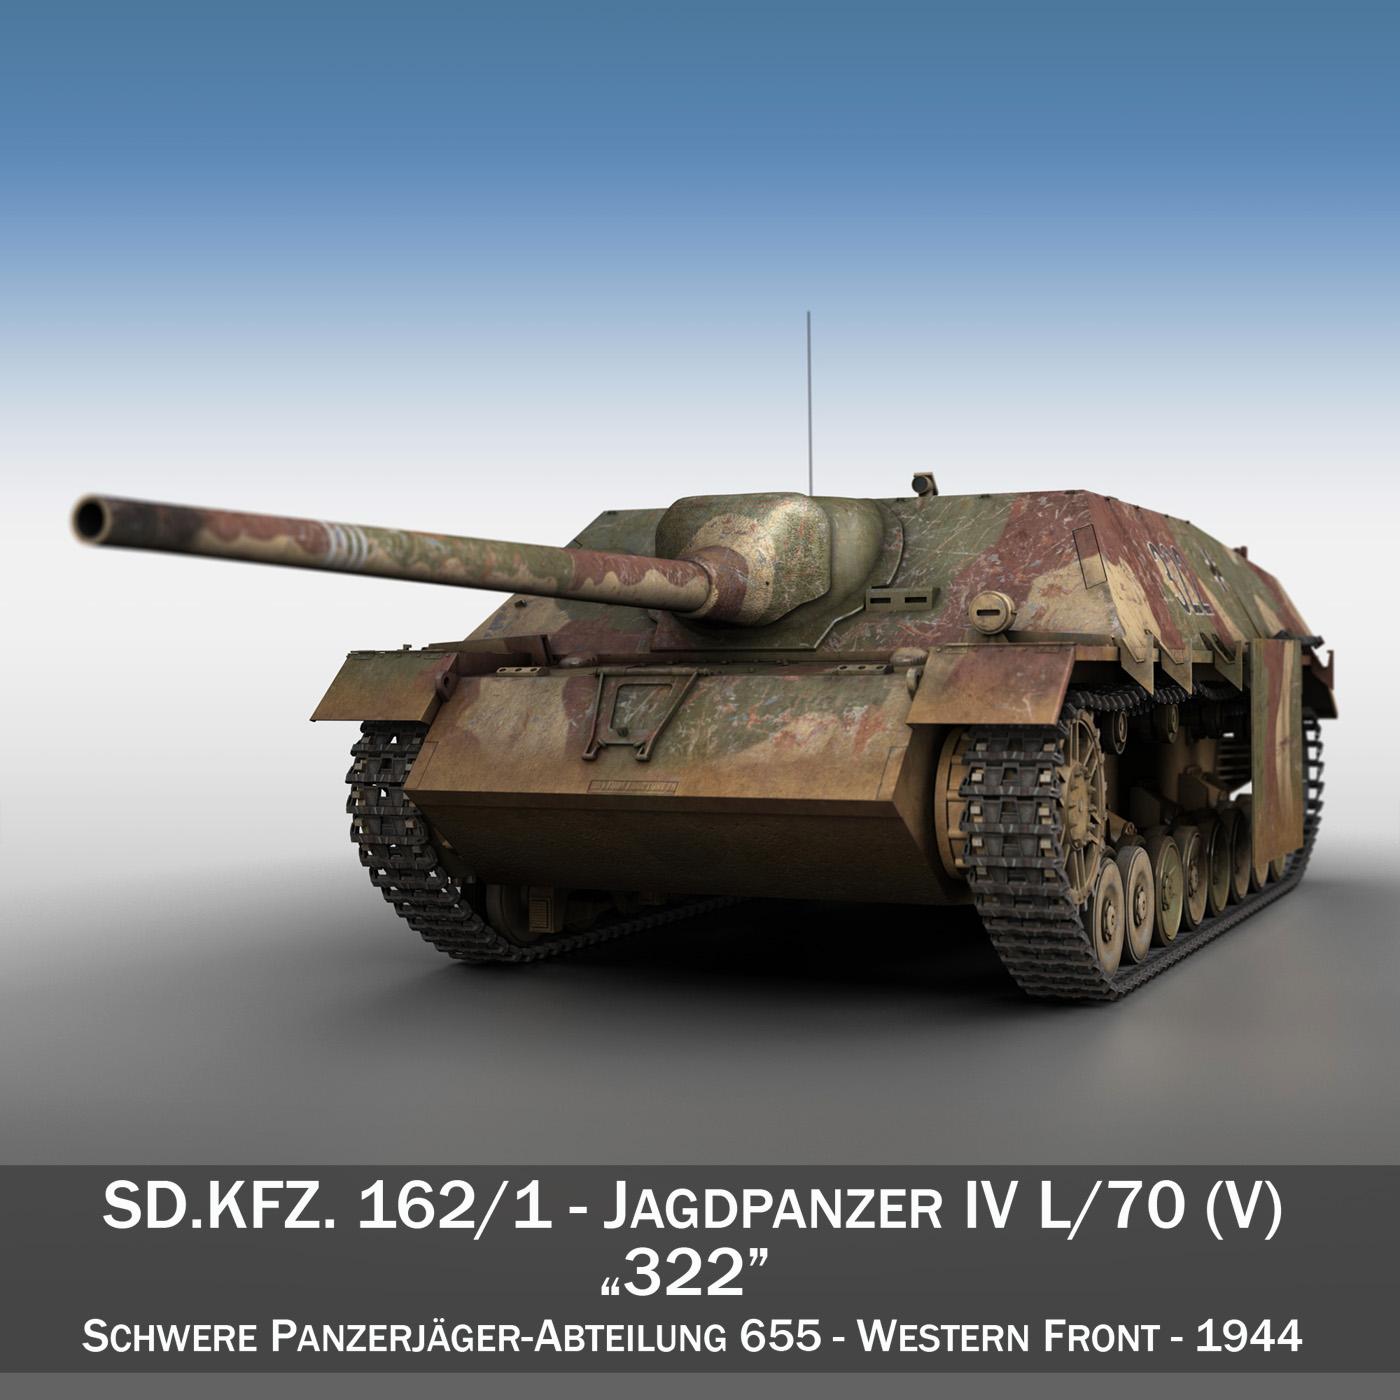 Jagdpanzer IV L/70 (V) - 322 - Late Production 3d model 3ds fbx c4d lwo lws lw obj 280411